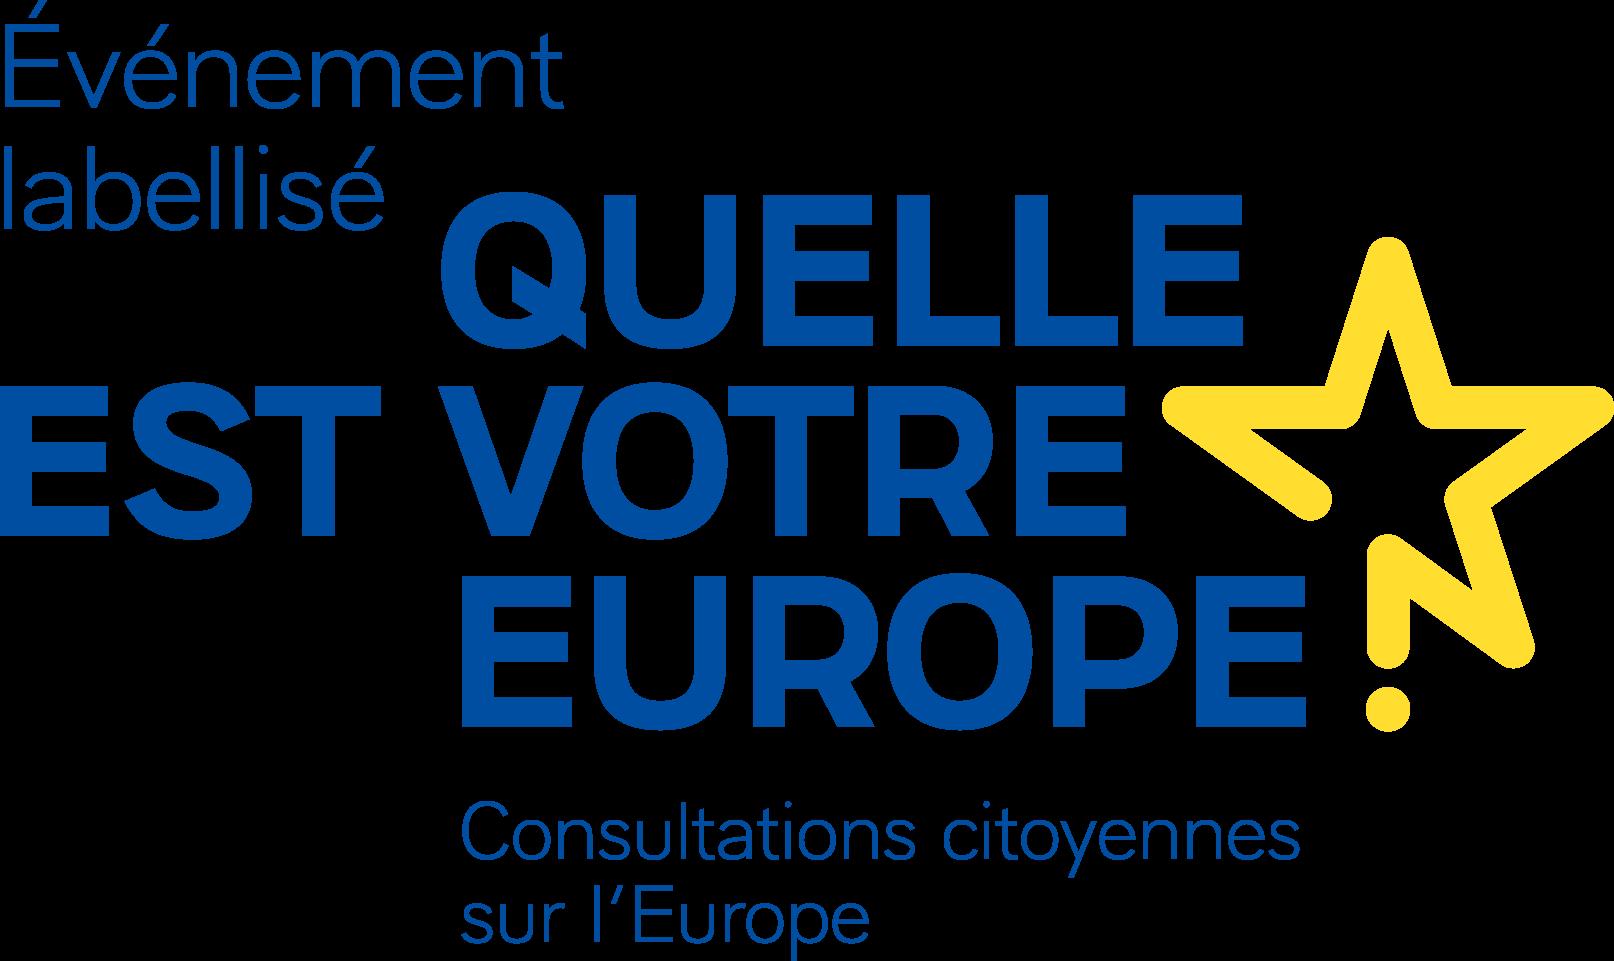 QuelleEstVotreEurope-EvenementLabellise-Bleu.png